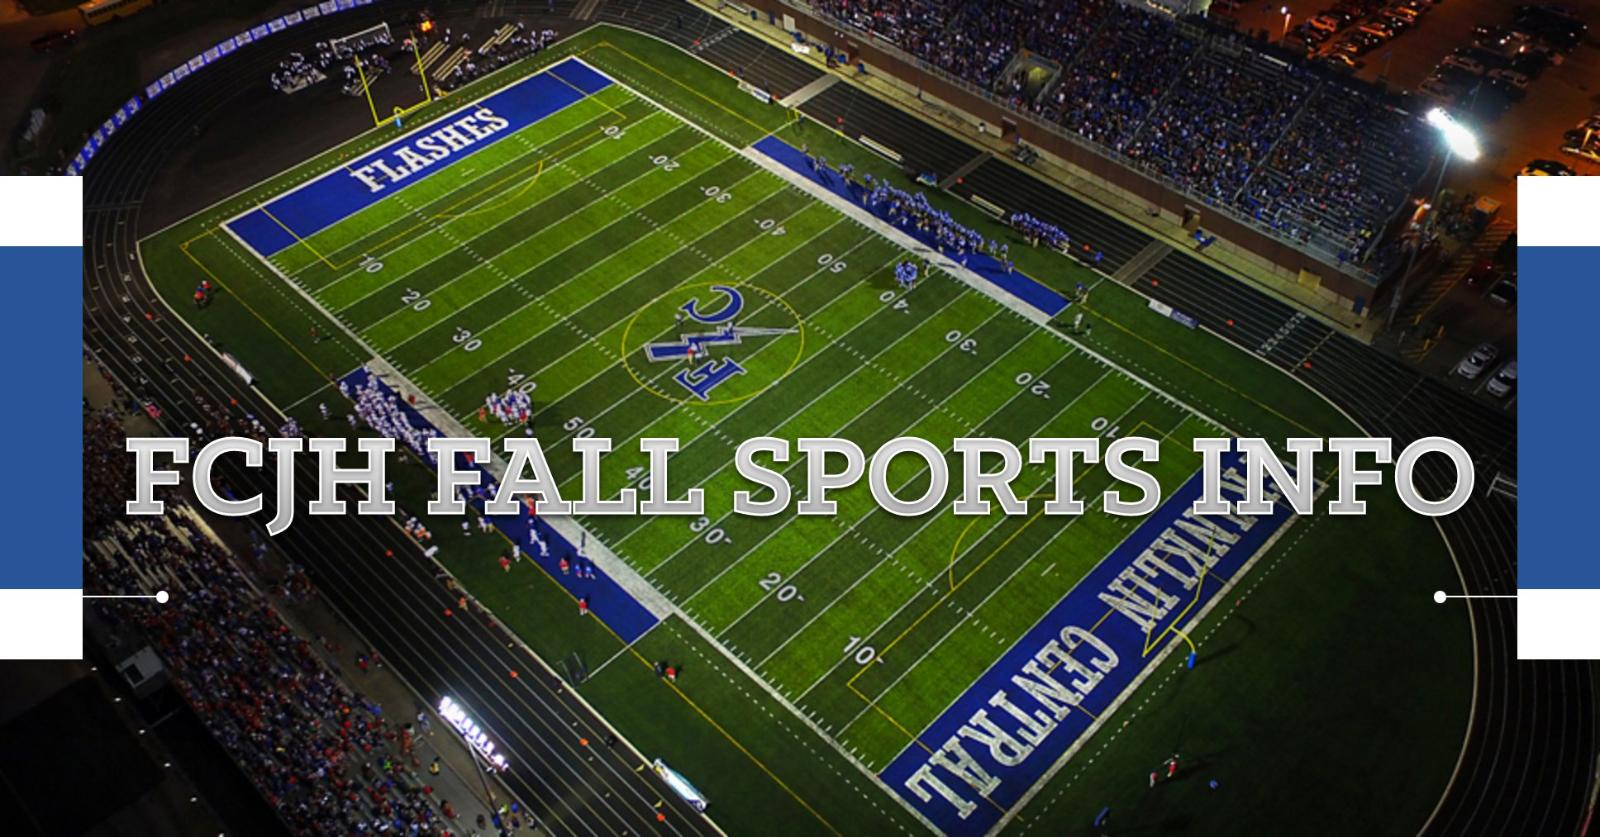 FCJH Fall Sports Info